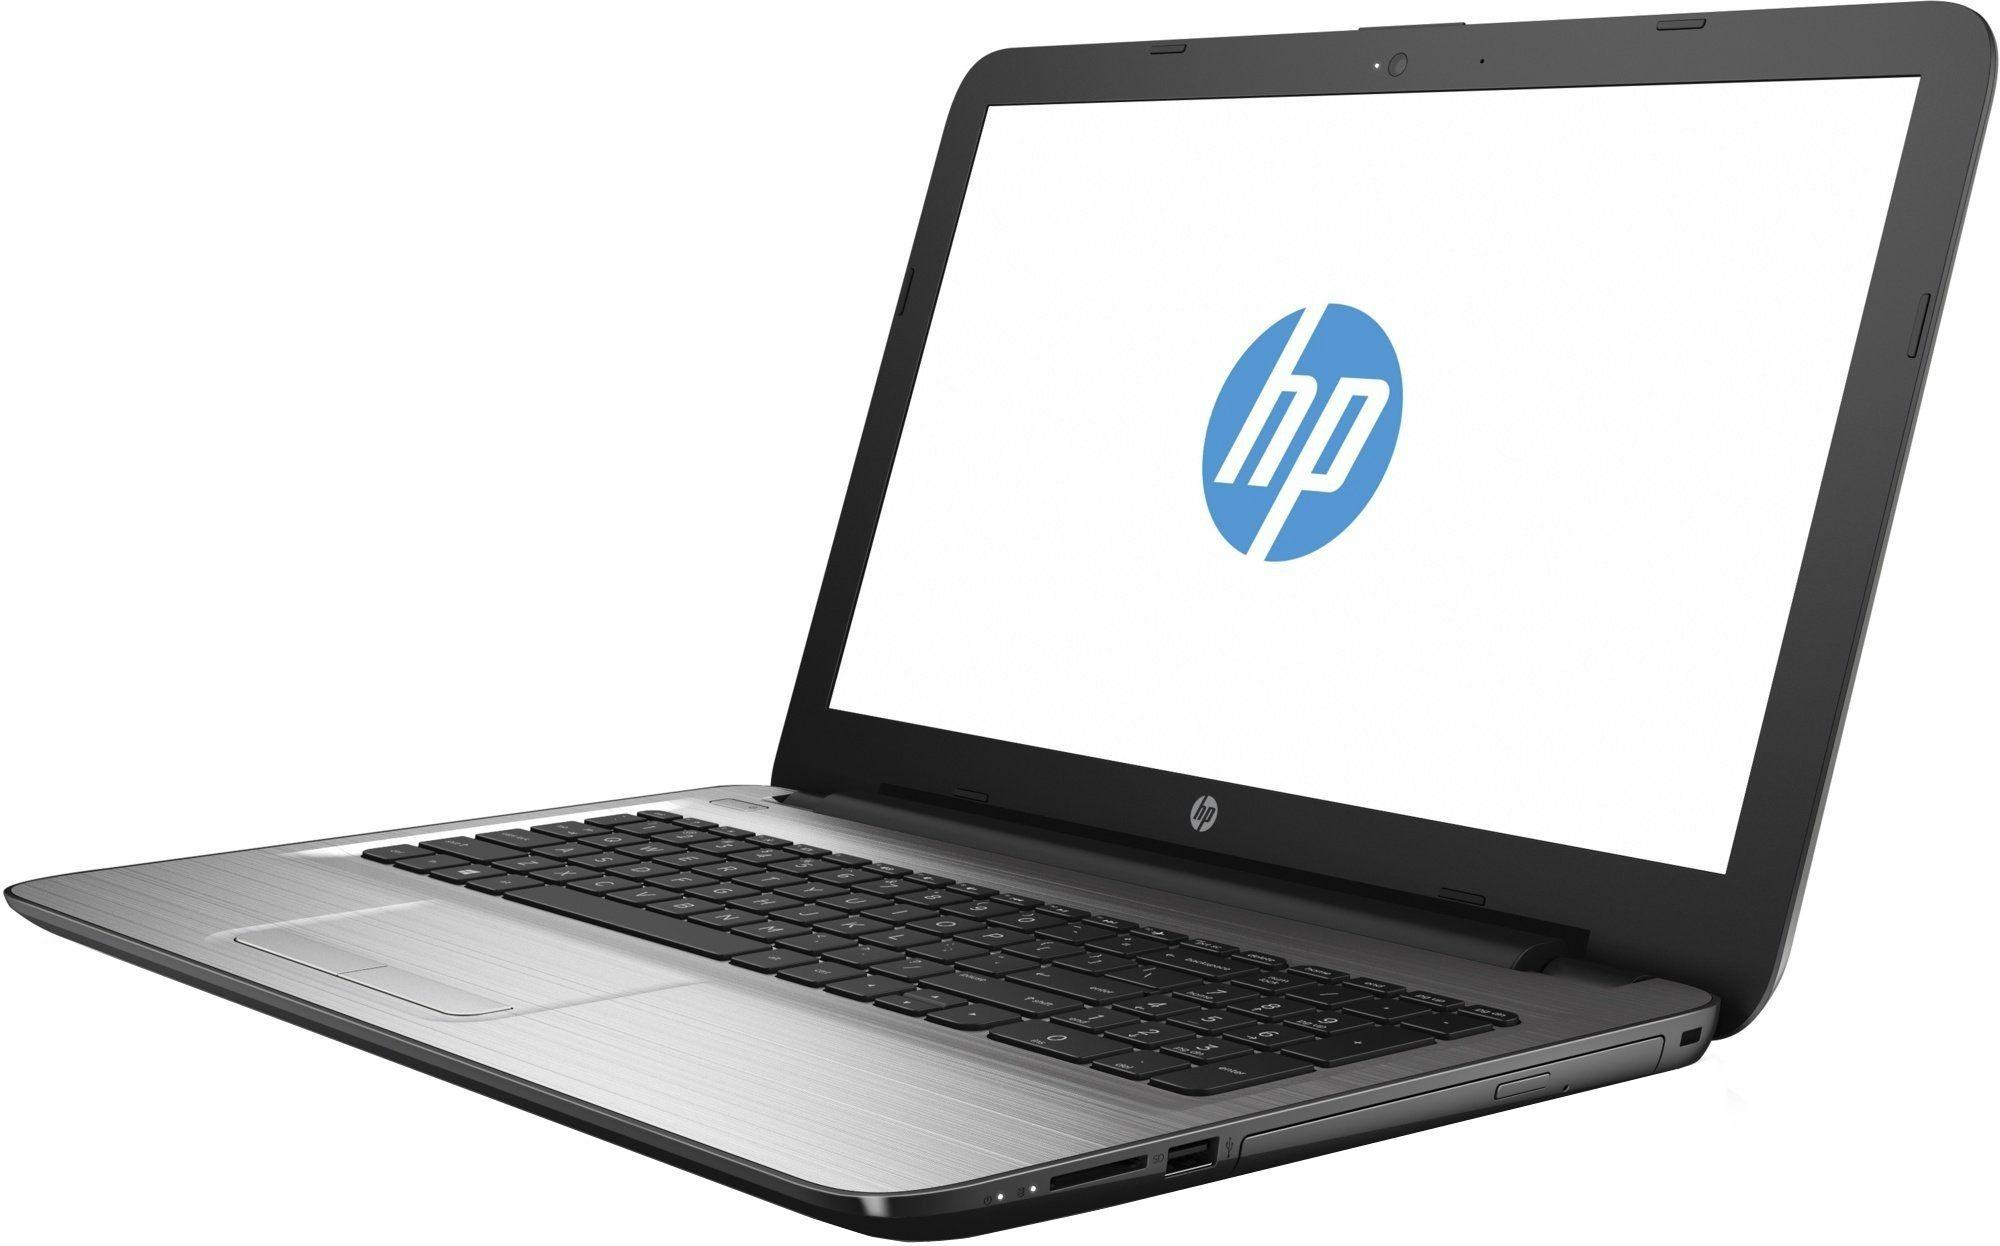 Купить Ноутбук HP Pavilion 15-ck033ur (3YA20EA) фото 2